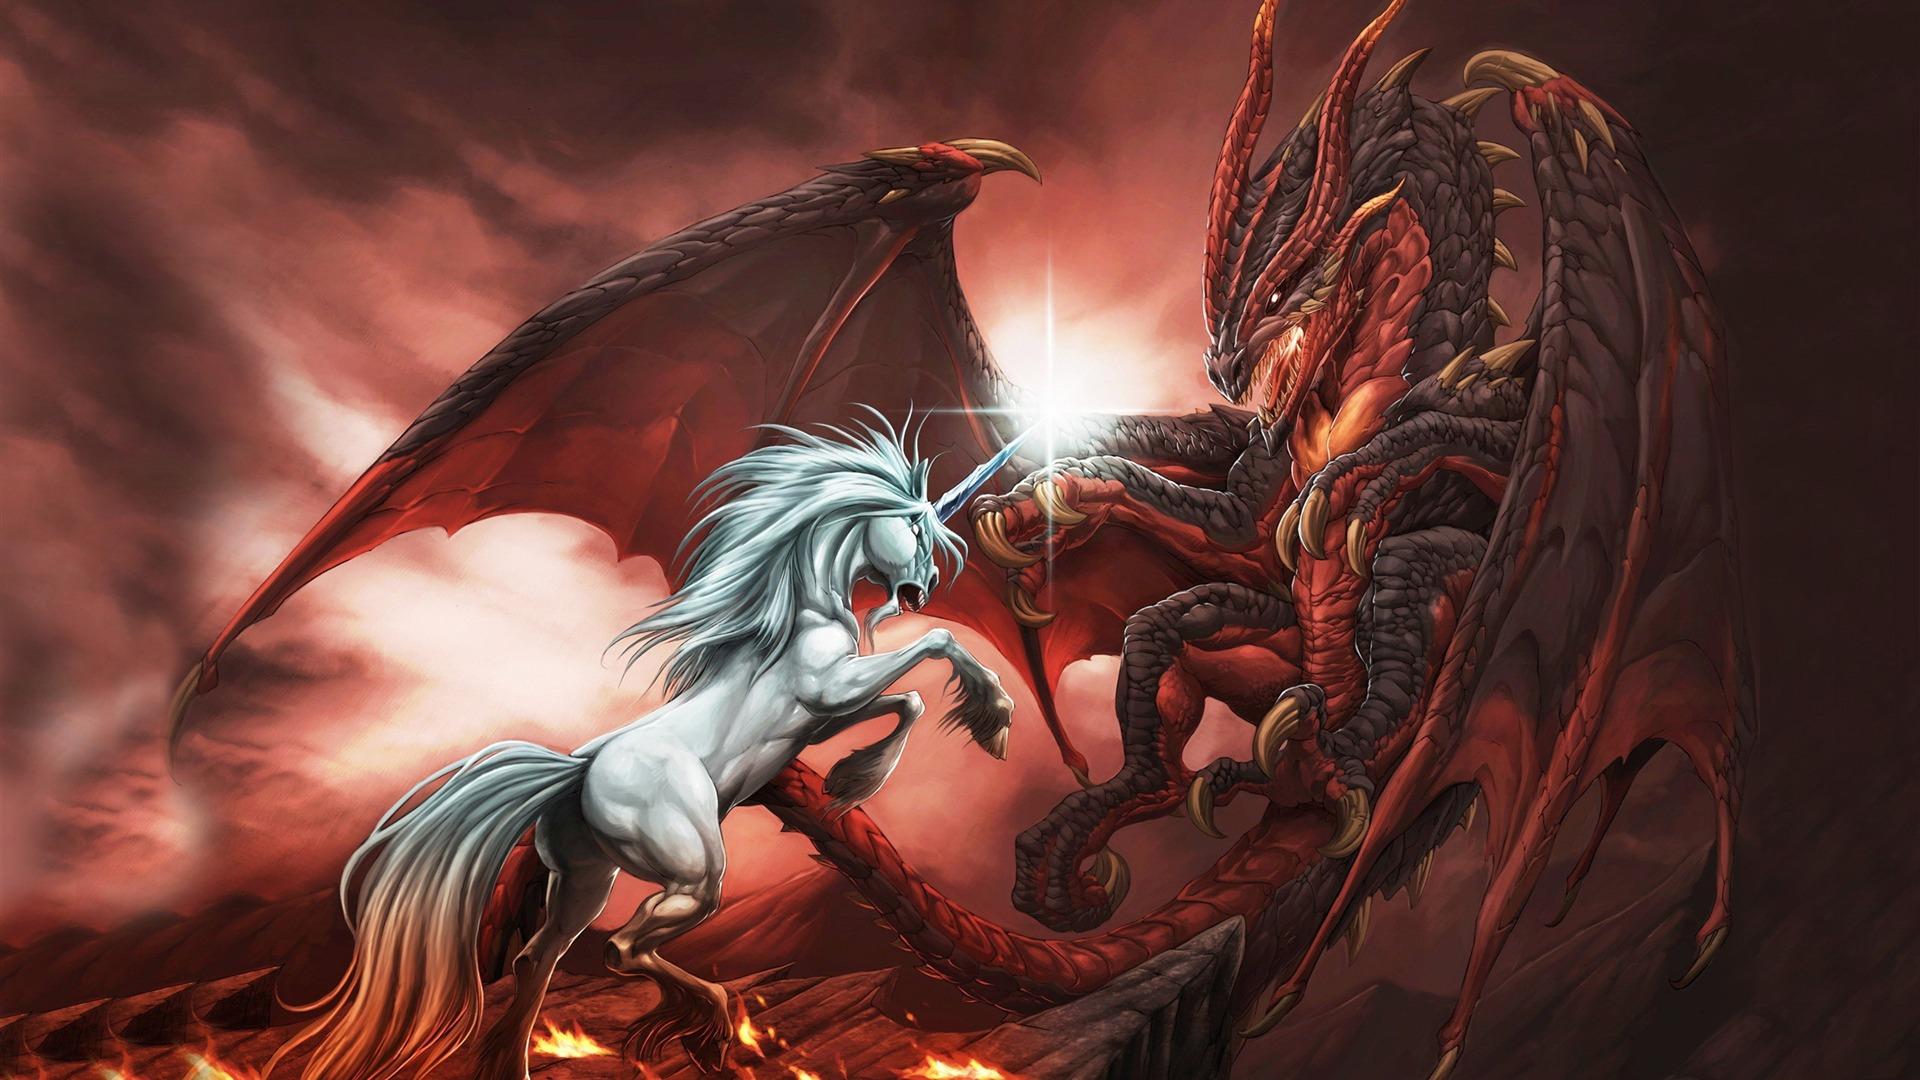 vs Dragon Dragon Art Wallpaper Design courant Taille 1920 x 1080 1920x1080